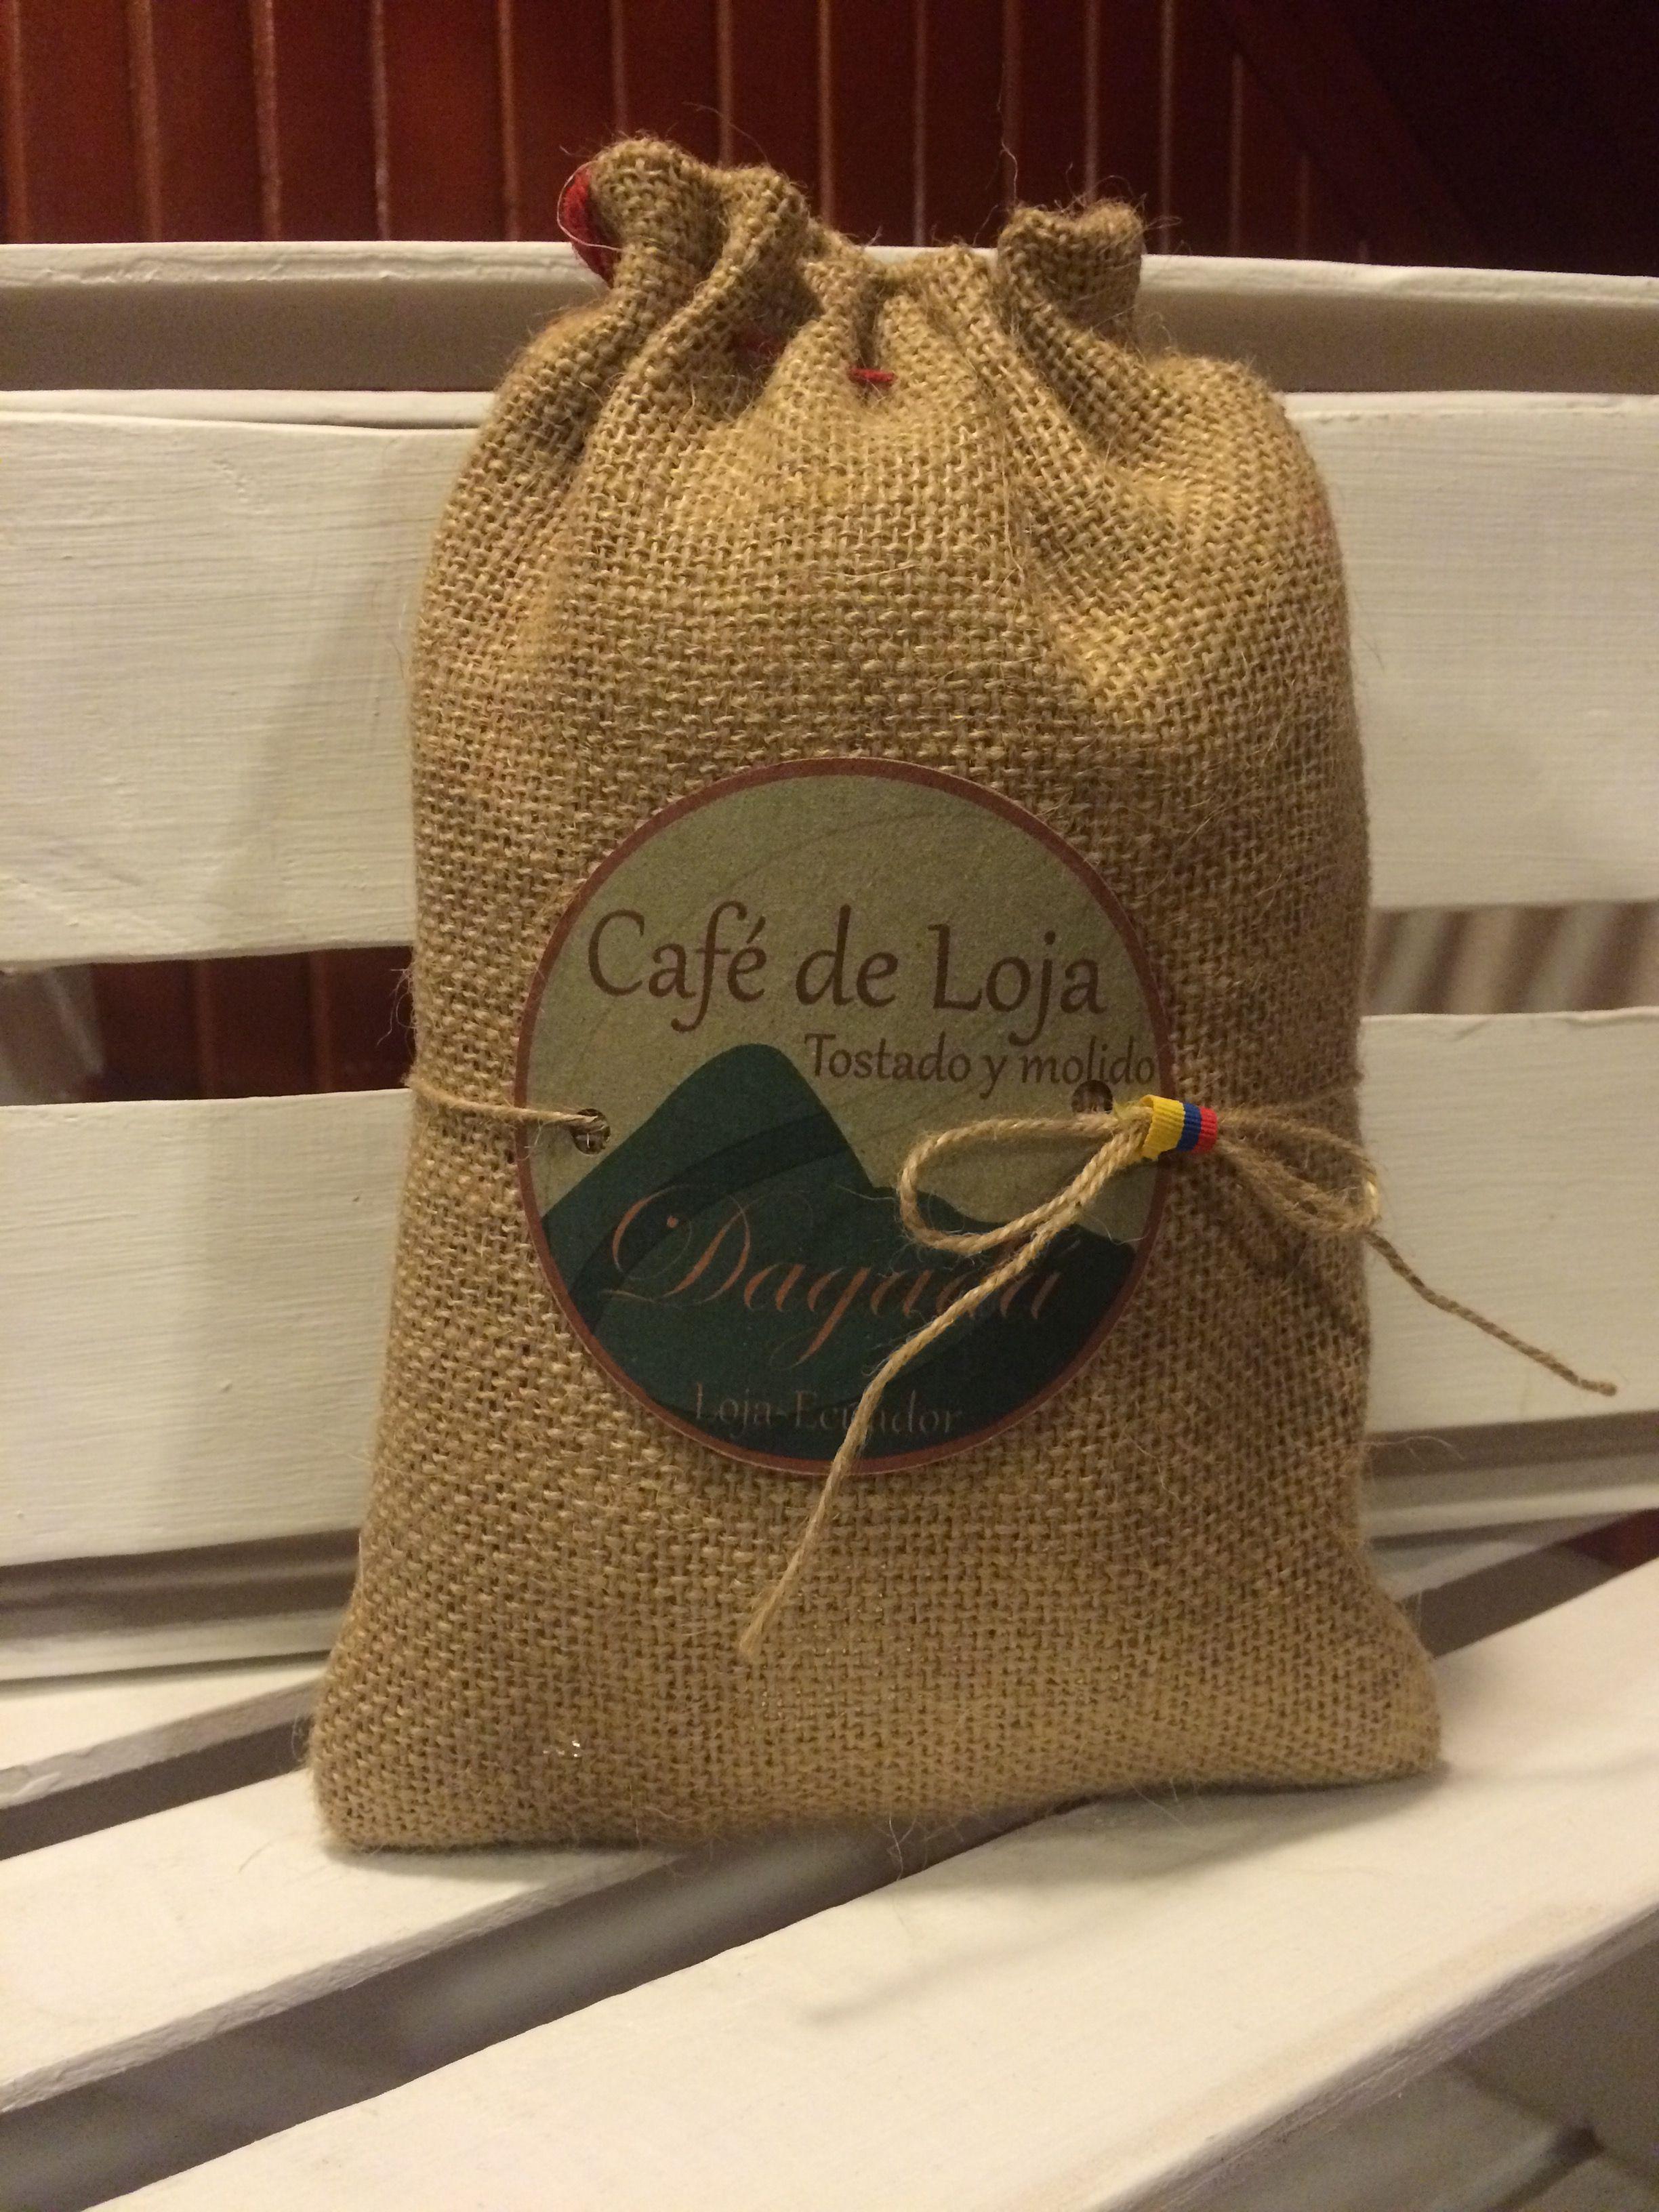 d9e23ef47 Pin de Paula Rodriguez en Cafe | Bolsas cafe, Empaques de cafe y Café